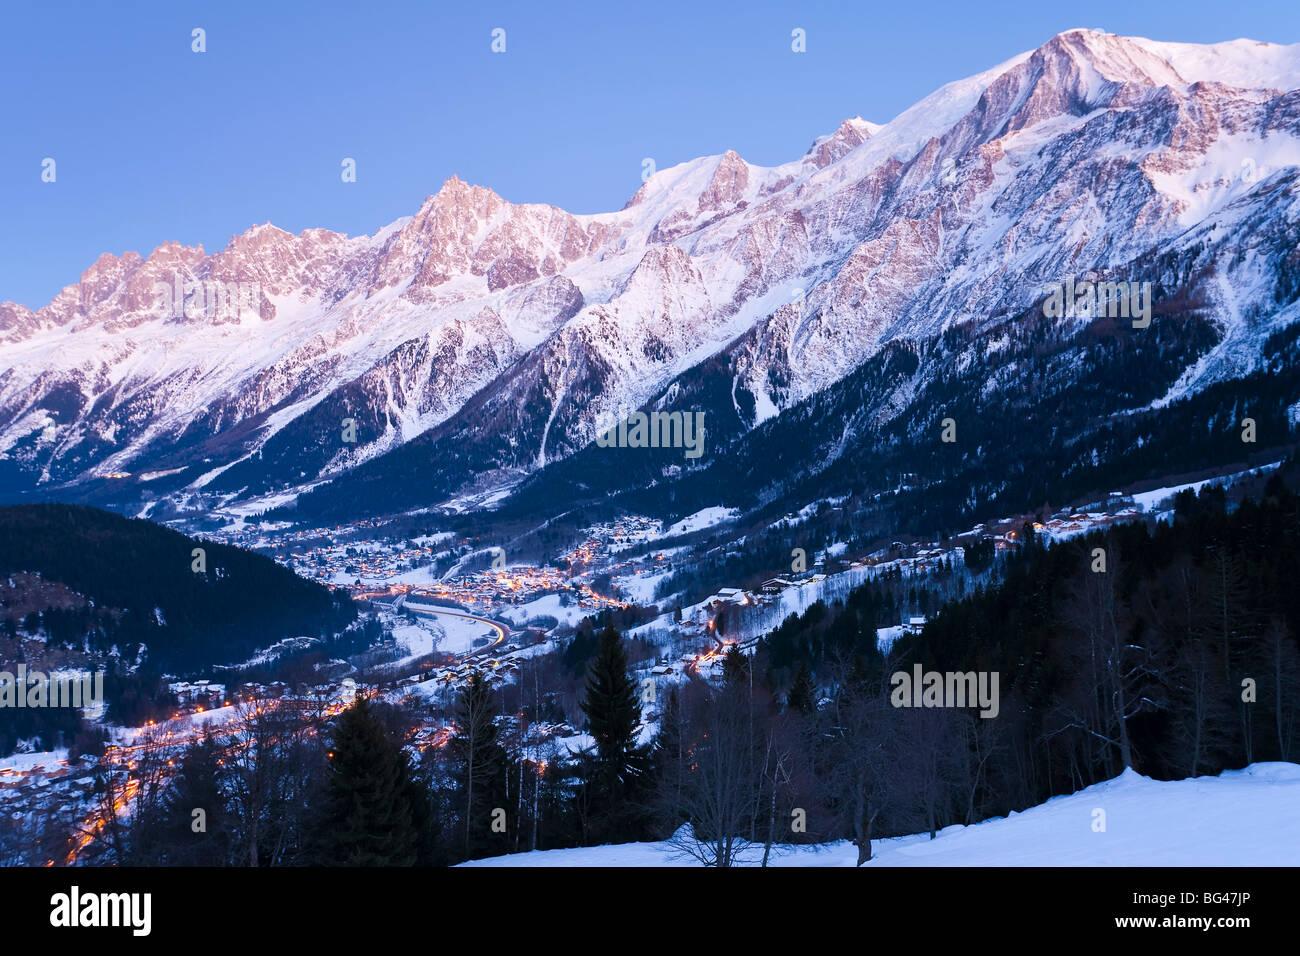 Chamonix-Mont-Blanc, French Alps, Haute Savoie,  France - Stock Image